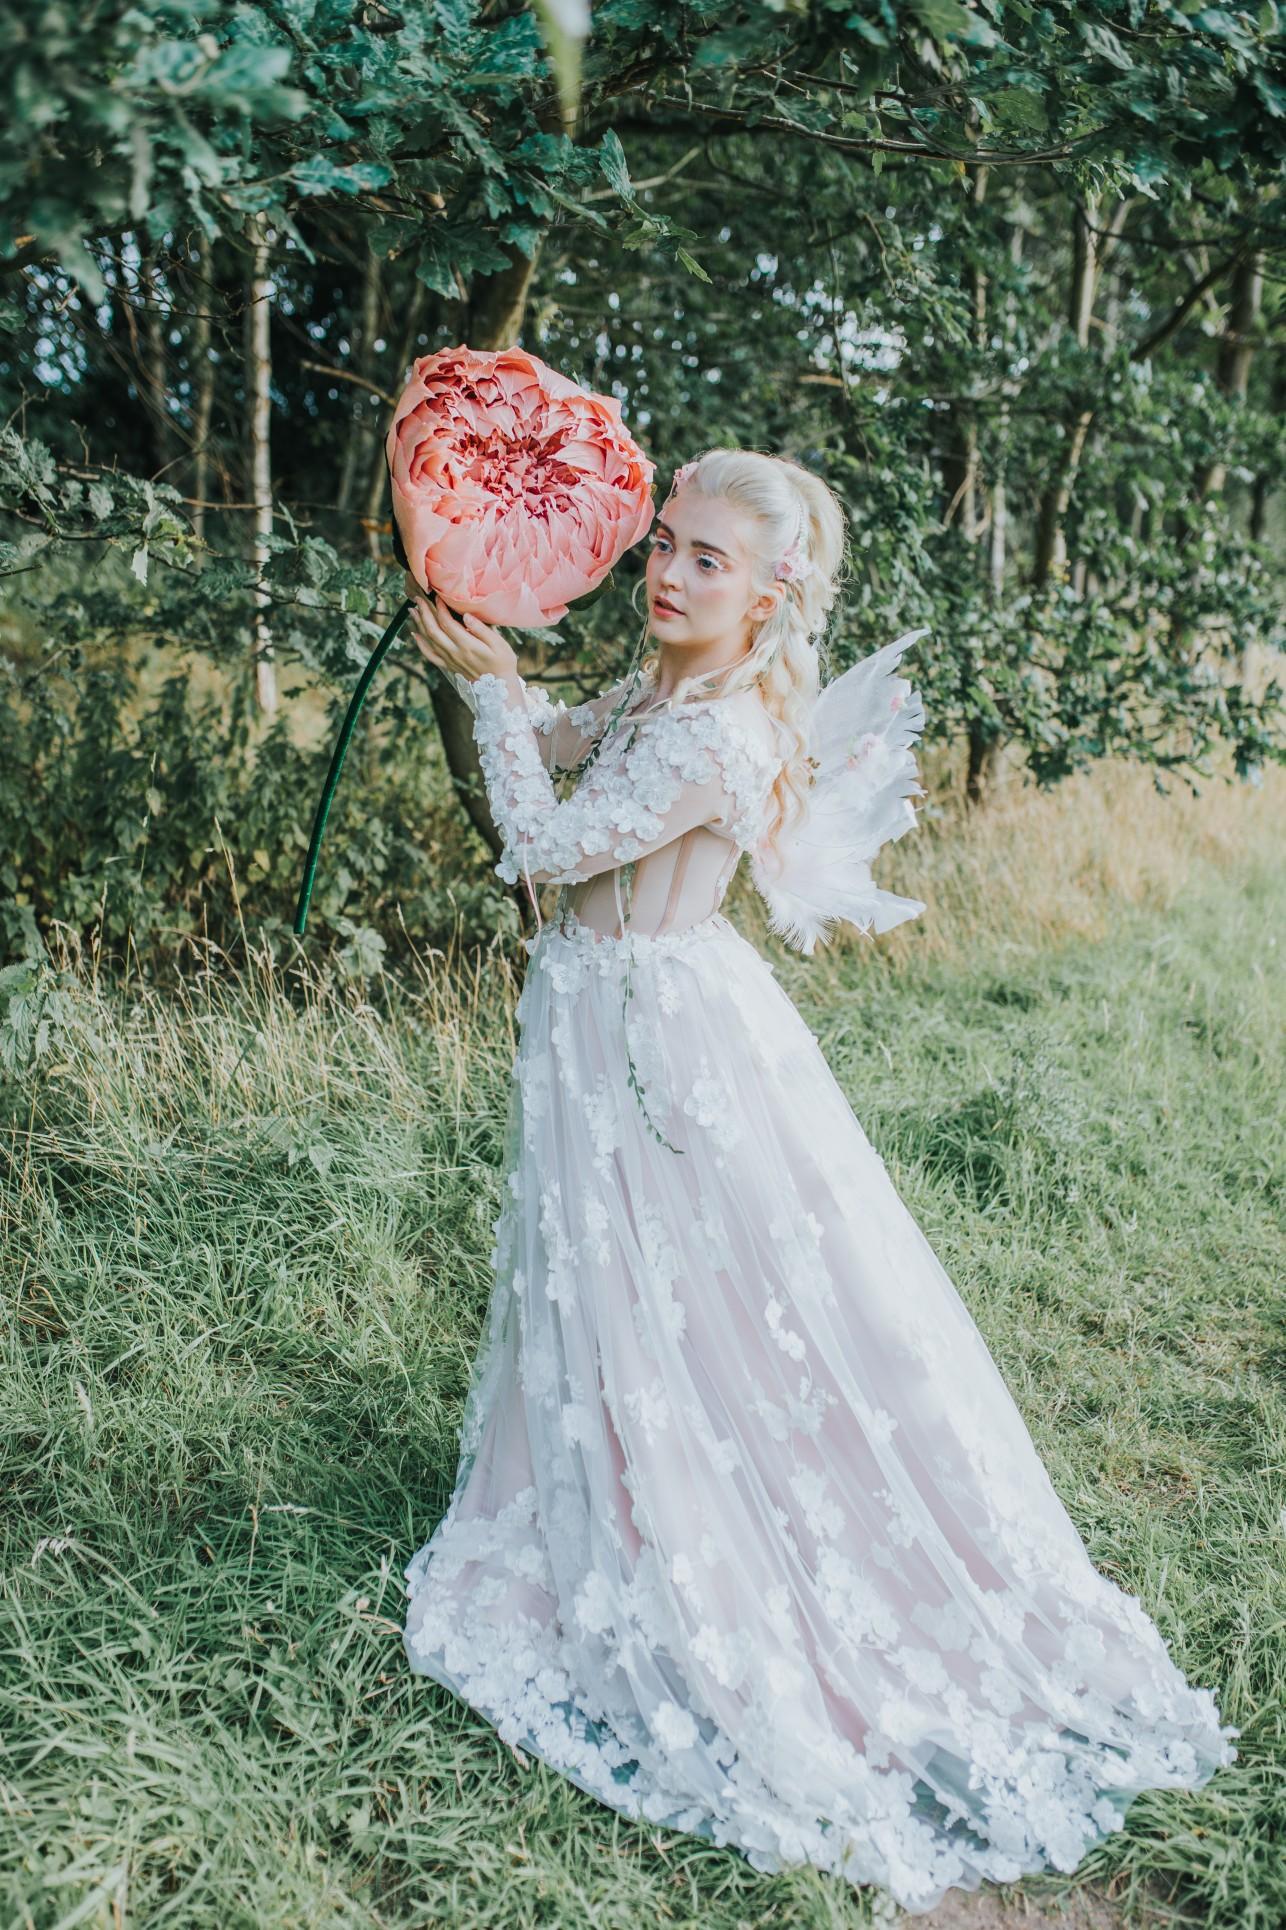 fairy wedding - whimsical wedding - magical wedding - elegant wedding dress - wedding paper flowers - unique bridal wear - unique wedding dress - woodland wedding